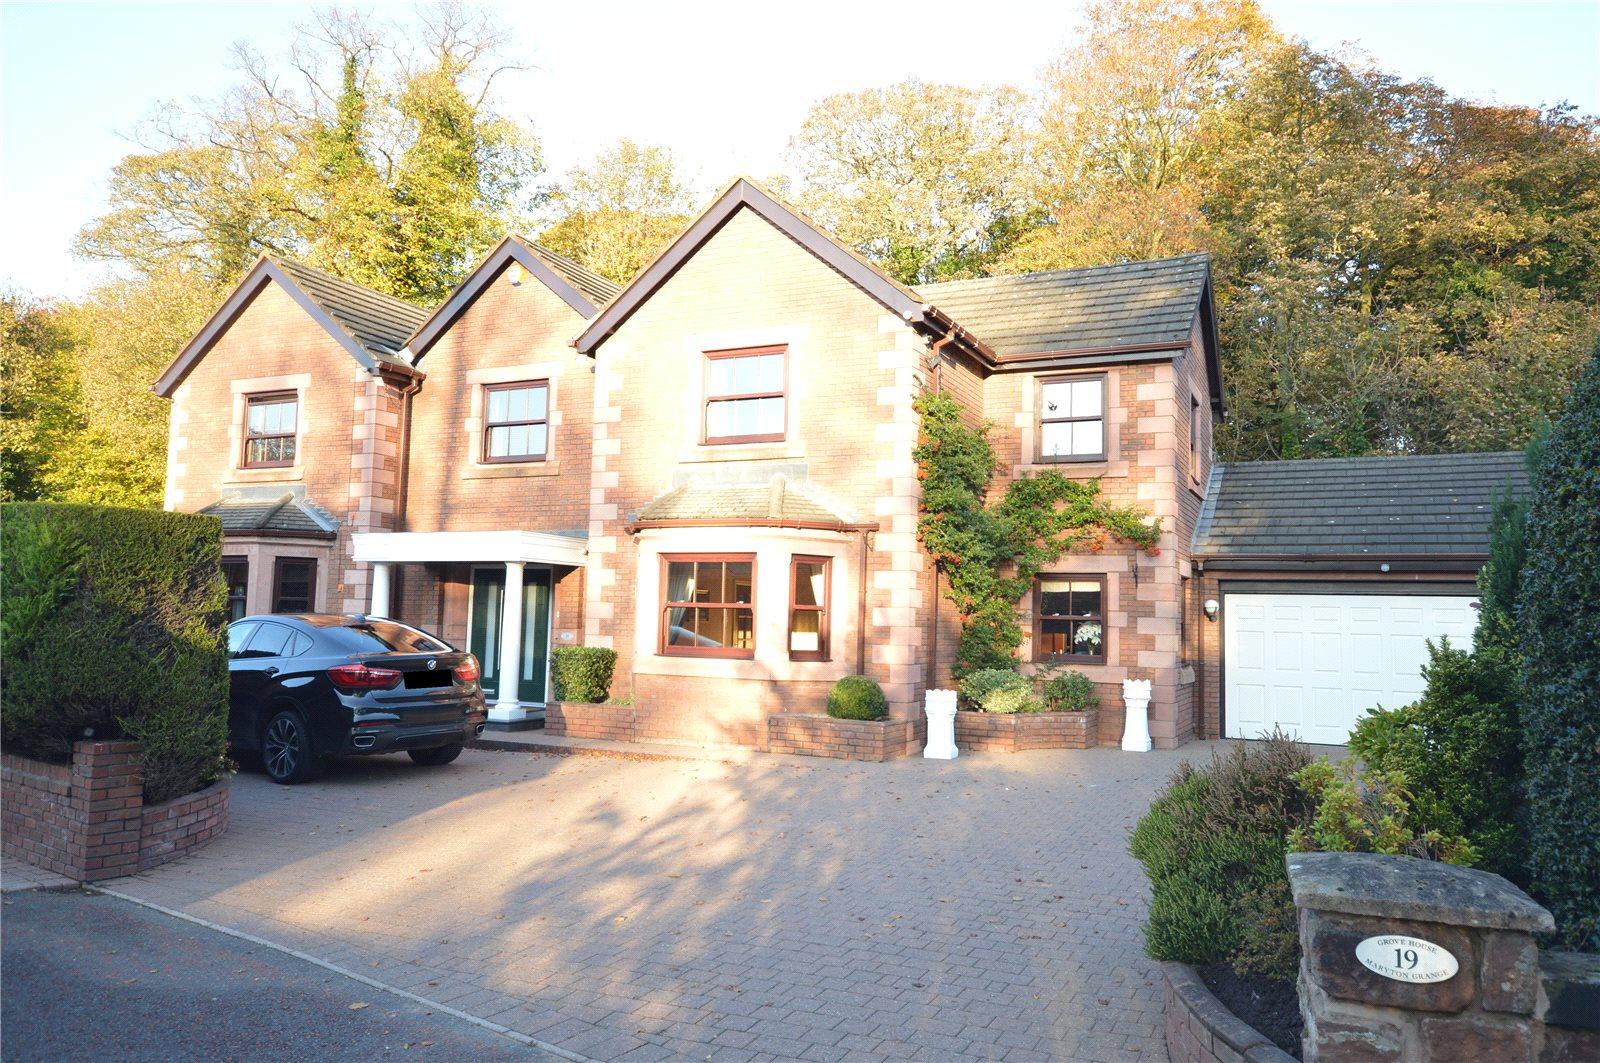 Maryton Grange, Calderstones, Liverpool, L18 3NU